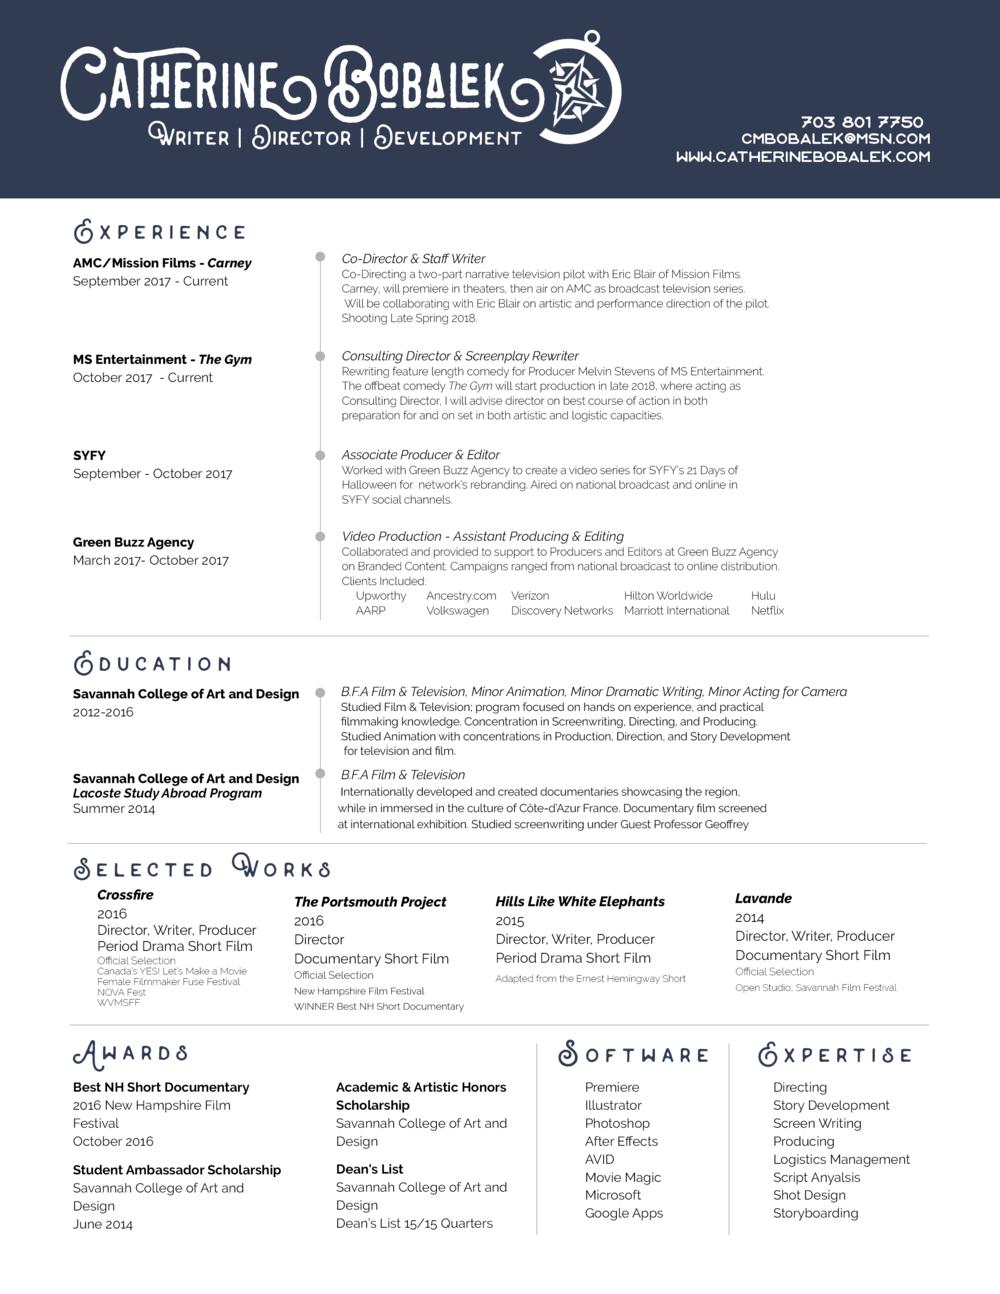 Resume — Catherine Bobalek